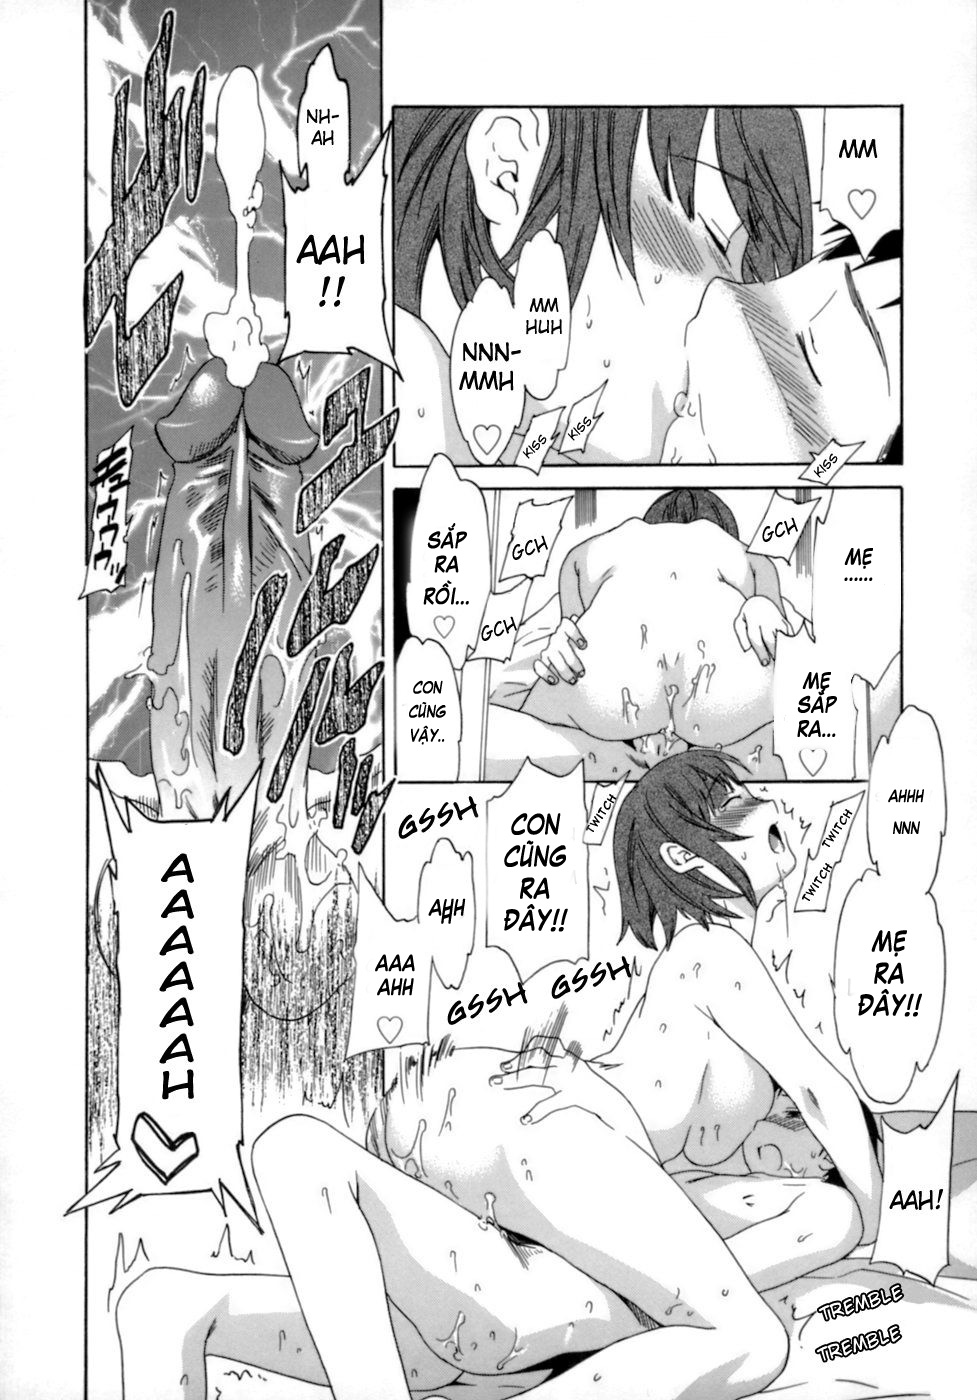 Truyện Hentai Mẹ rất yêu con